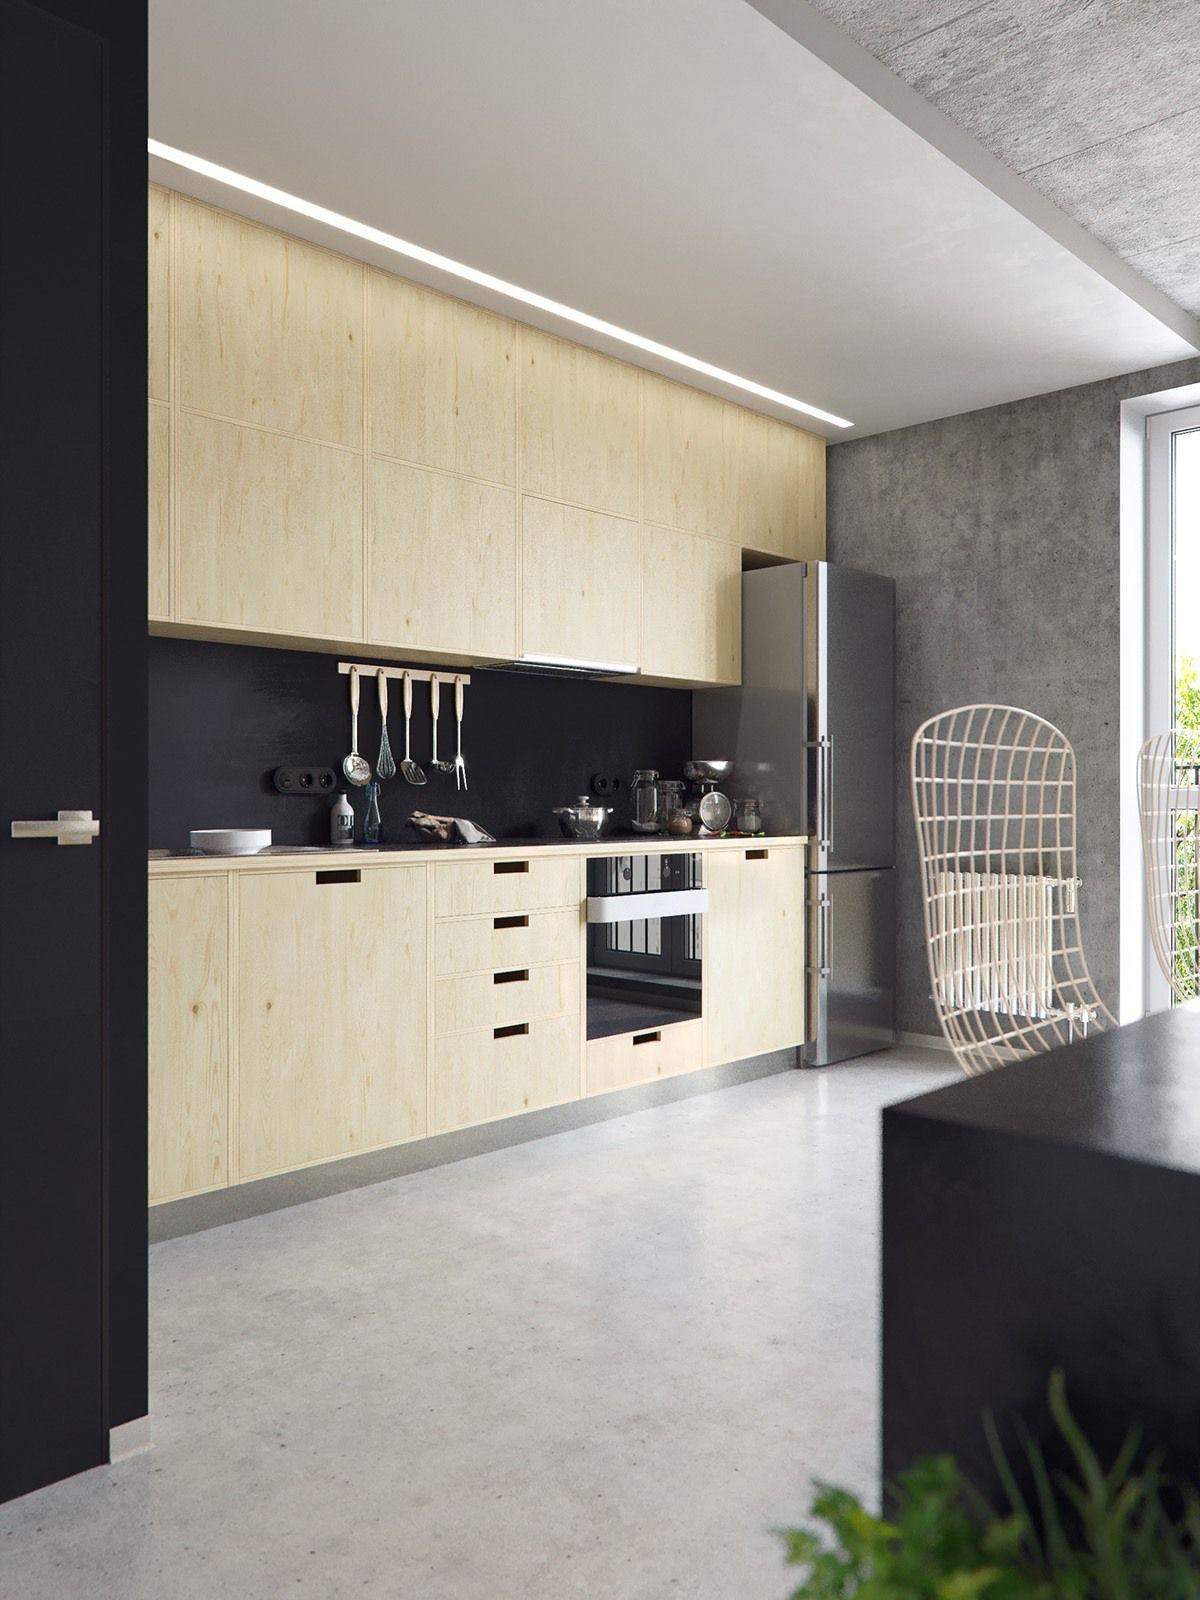 3 Concrete Lofts With Wide Open Floor Plans Kitchen